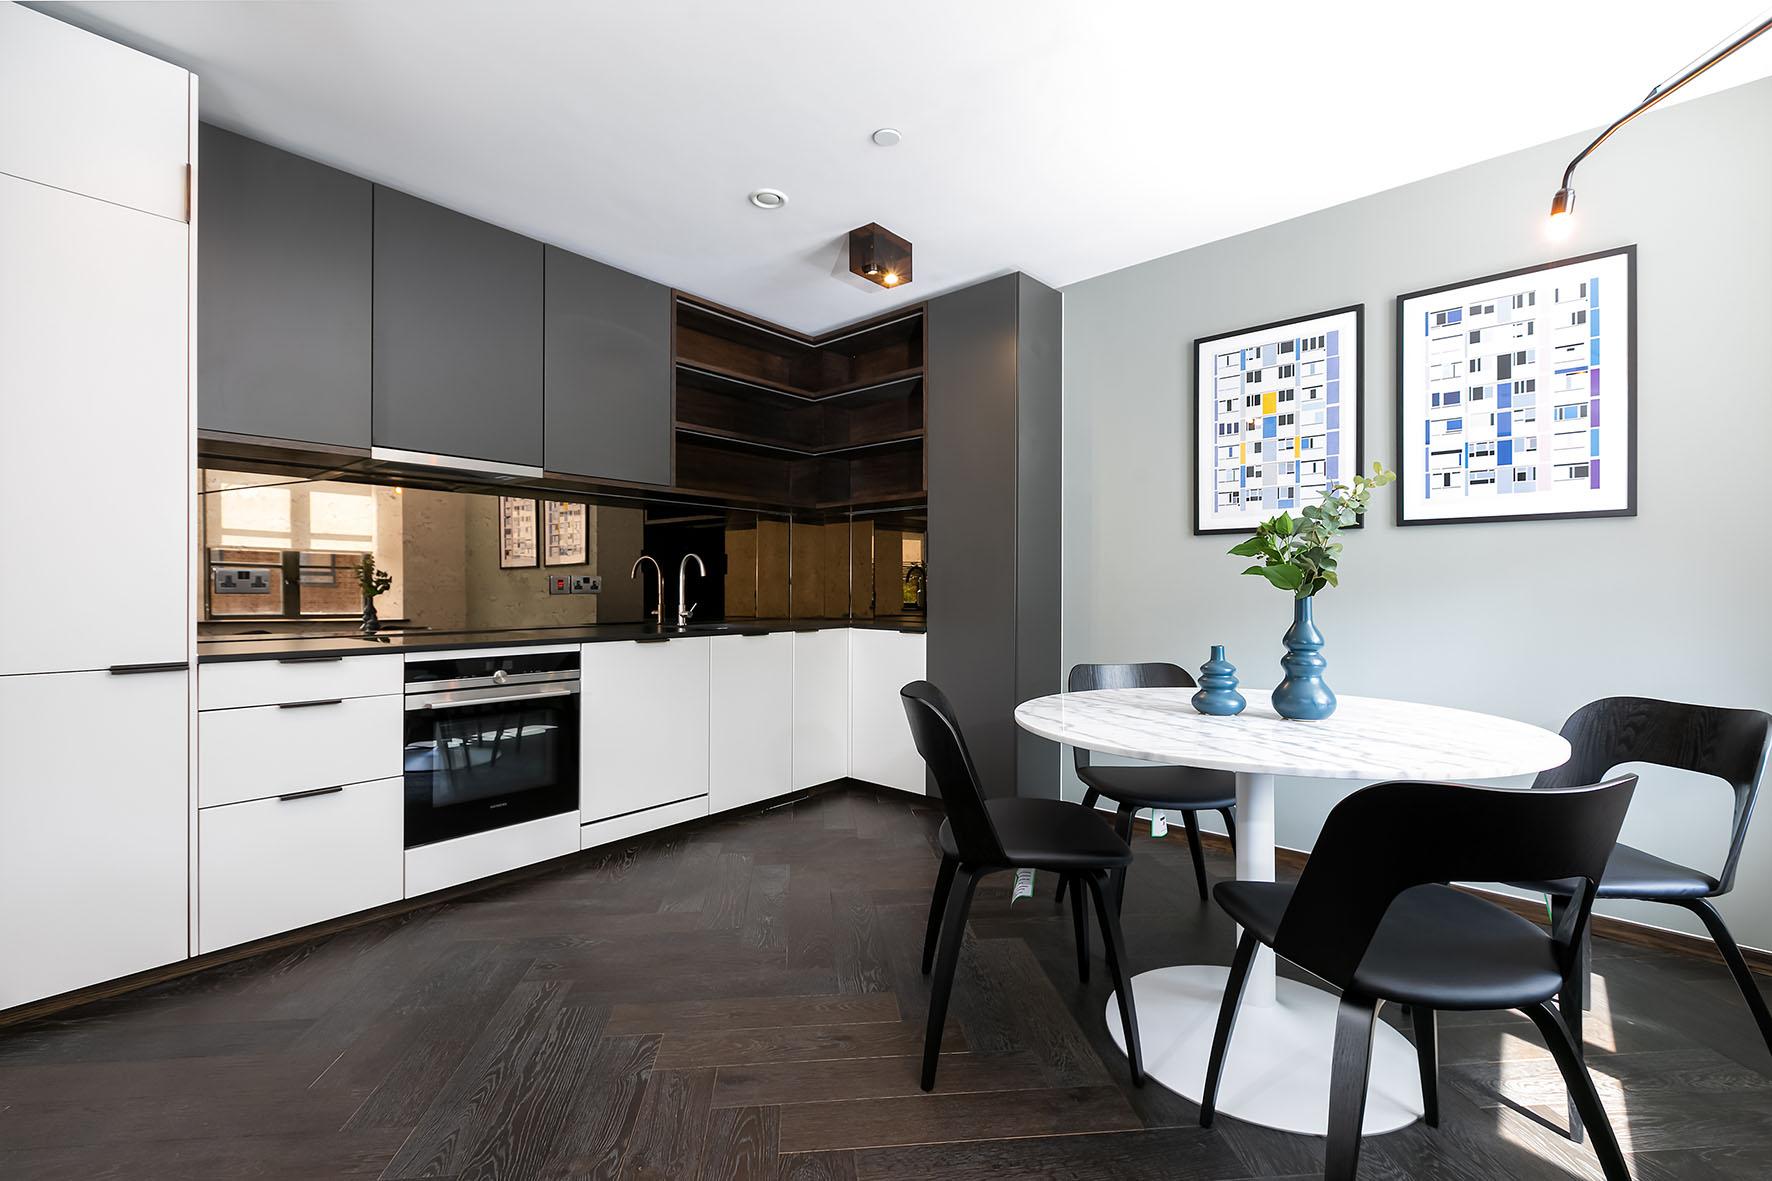 Lovelydays luxury service apartment rental - London - Soho - Oxford Street V - Lovelysuite - 1 bedrooms - 1 bathrooms - Luxury kitchen - 4716c054f383 - Lovelydays